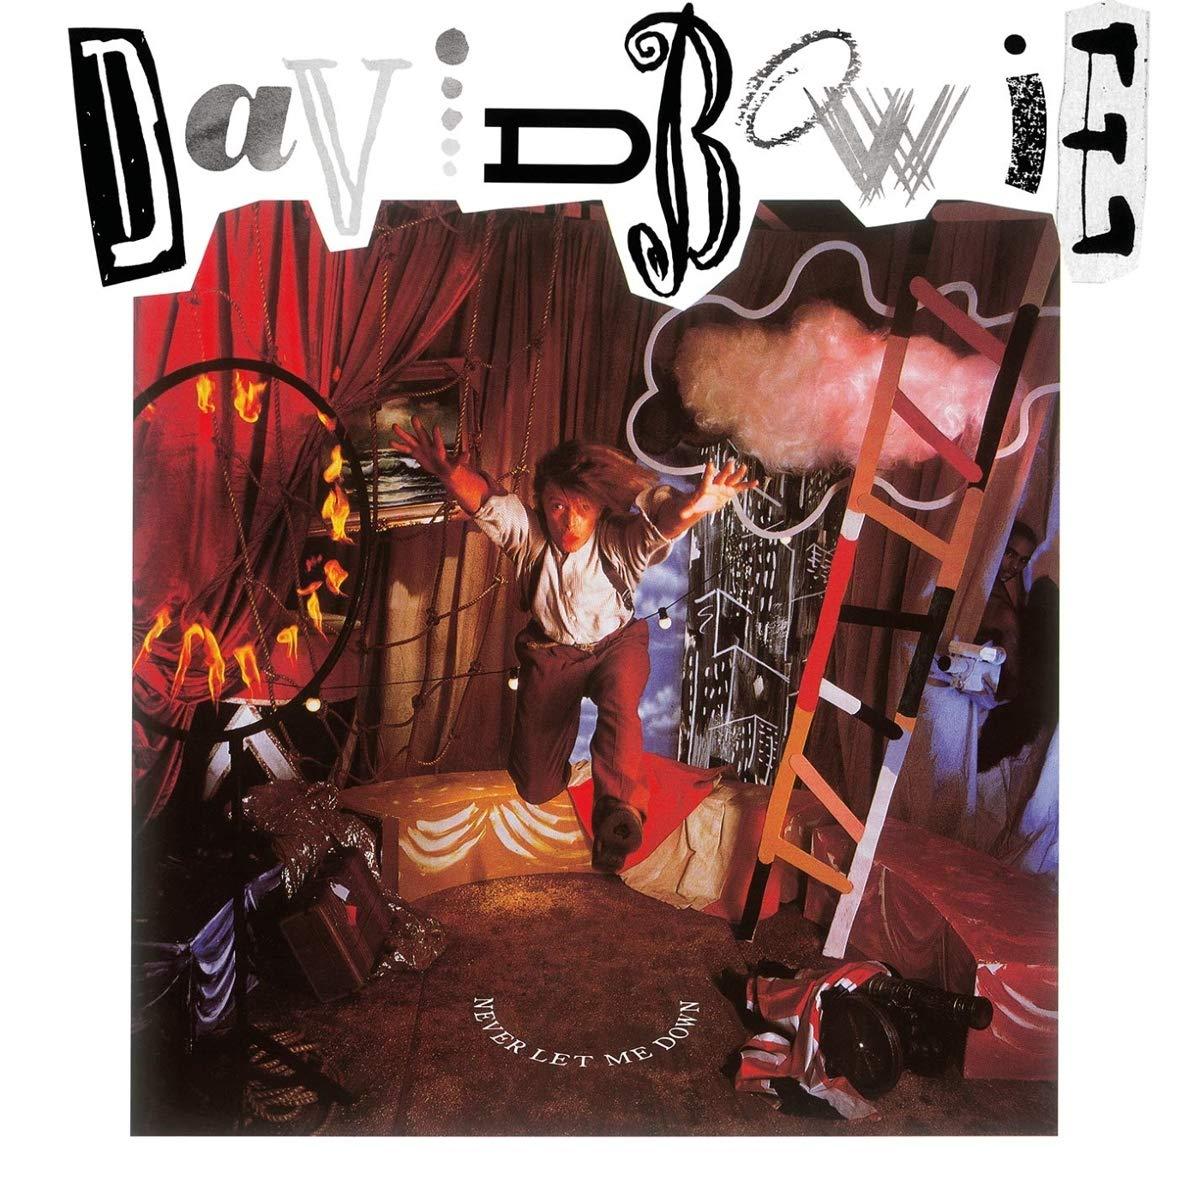 43a0497f91a David Bowie